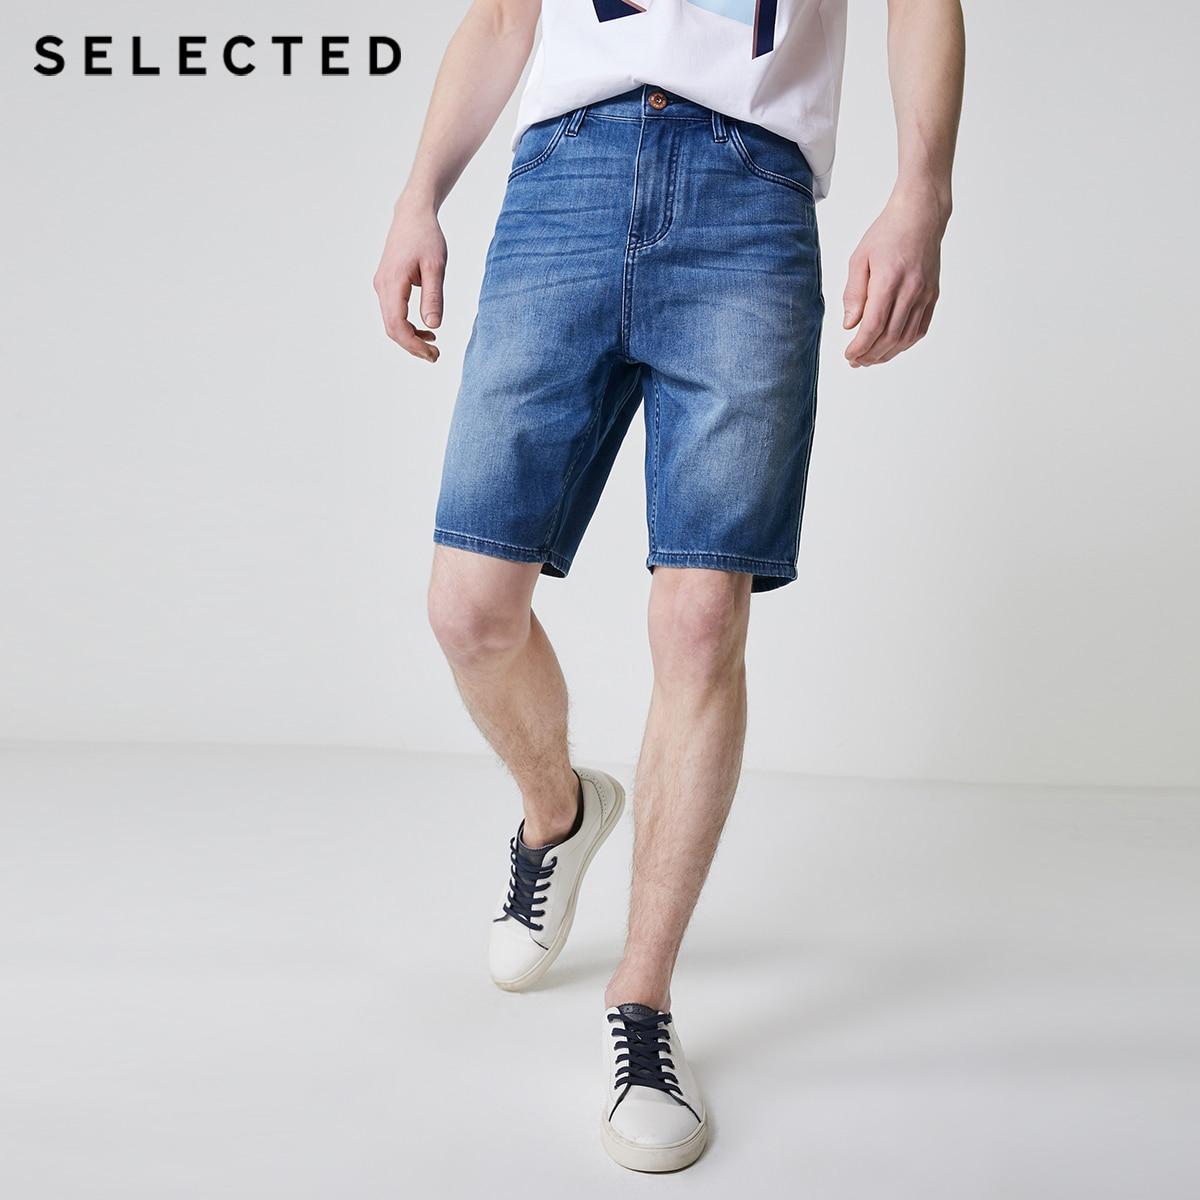 SELECTED Men's Casual Loose Fit Faded Denim Shorts C|4192S3510